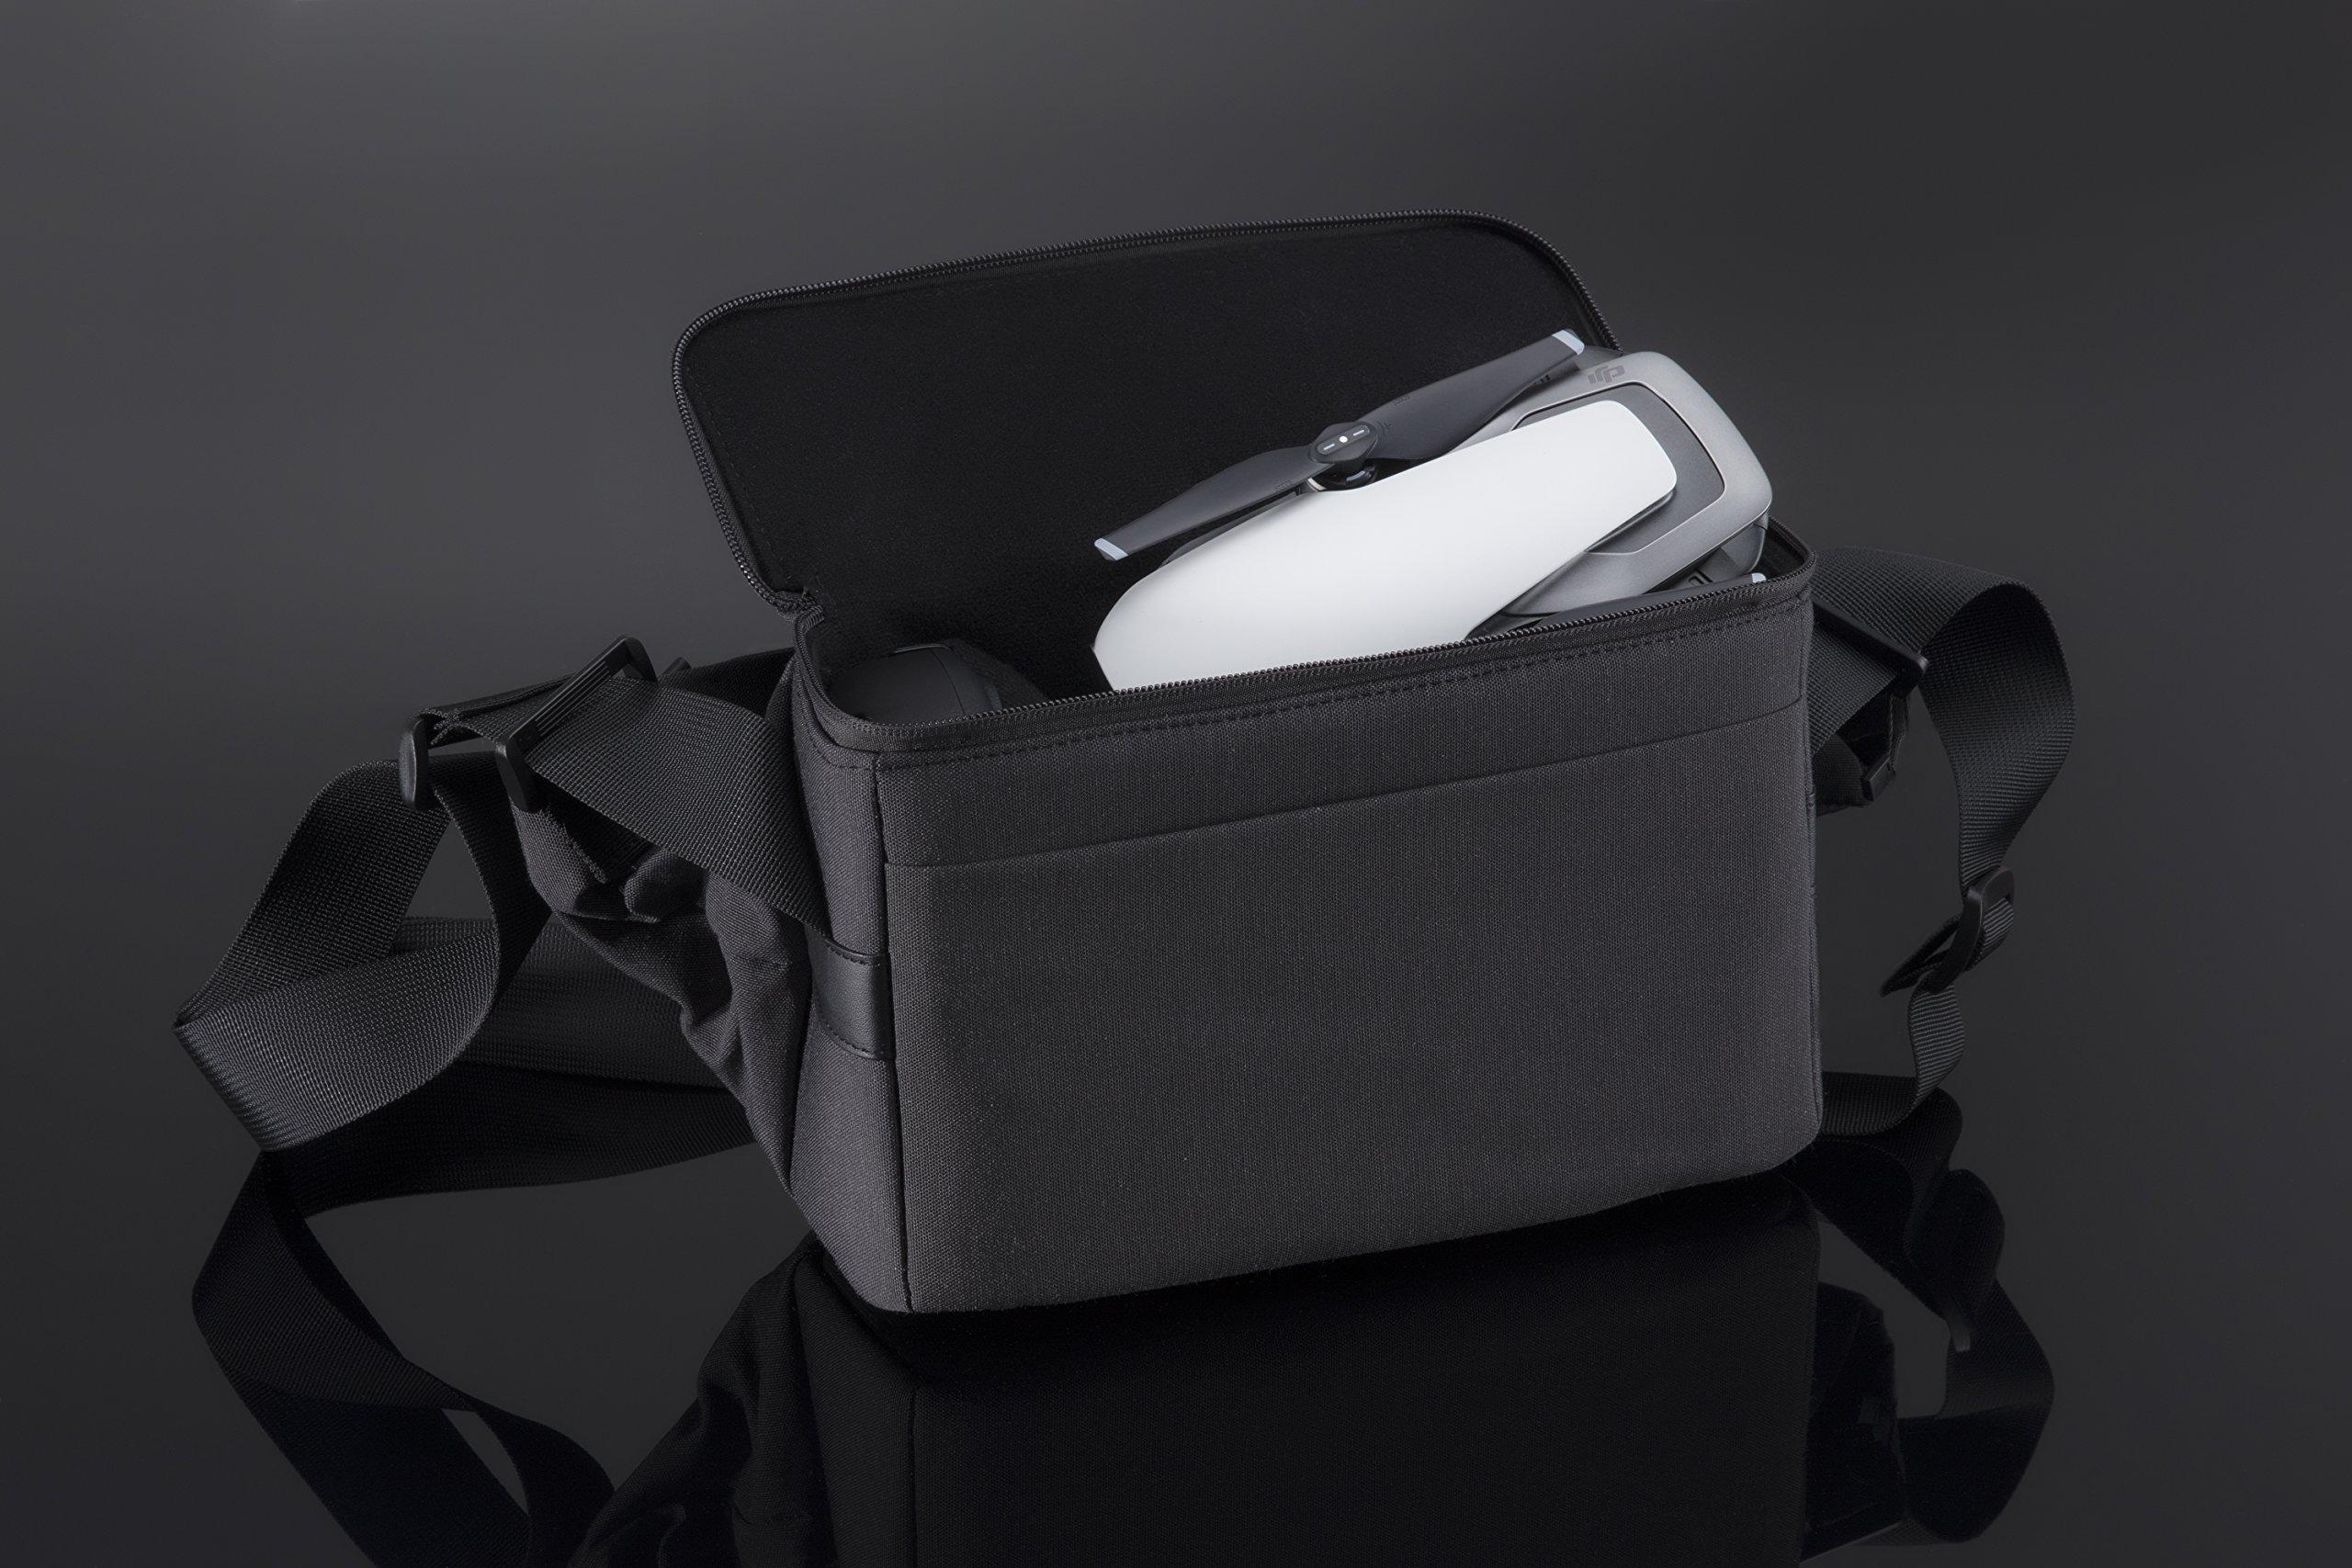 DJI Mavic AIR Part 15 Travel Bag - Black - CP.PT.00000201.01